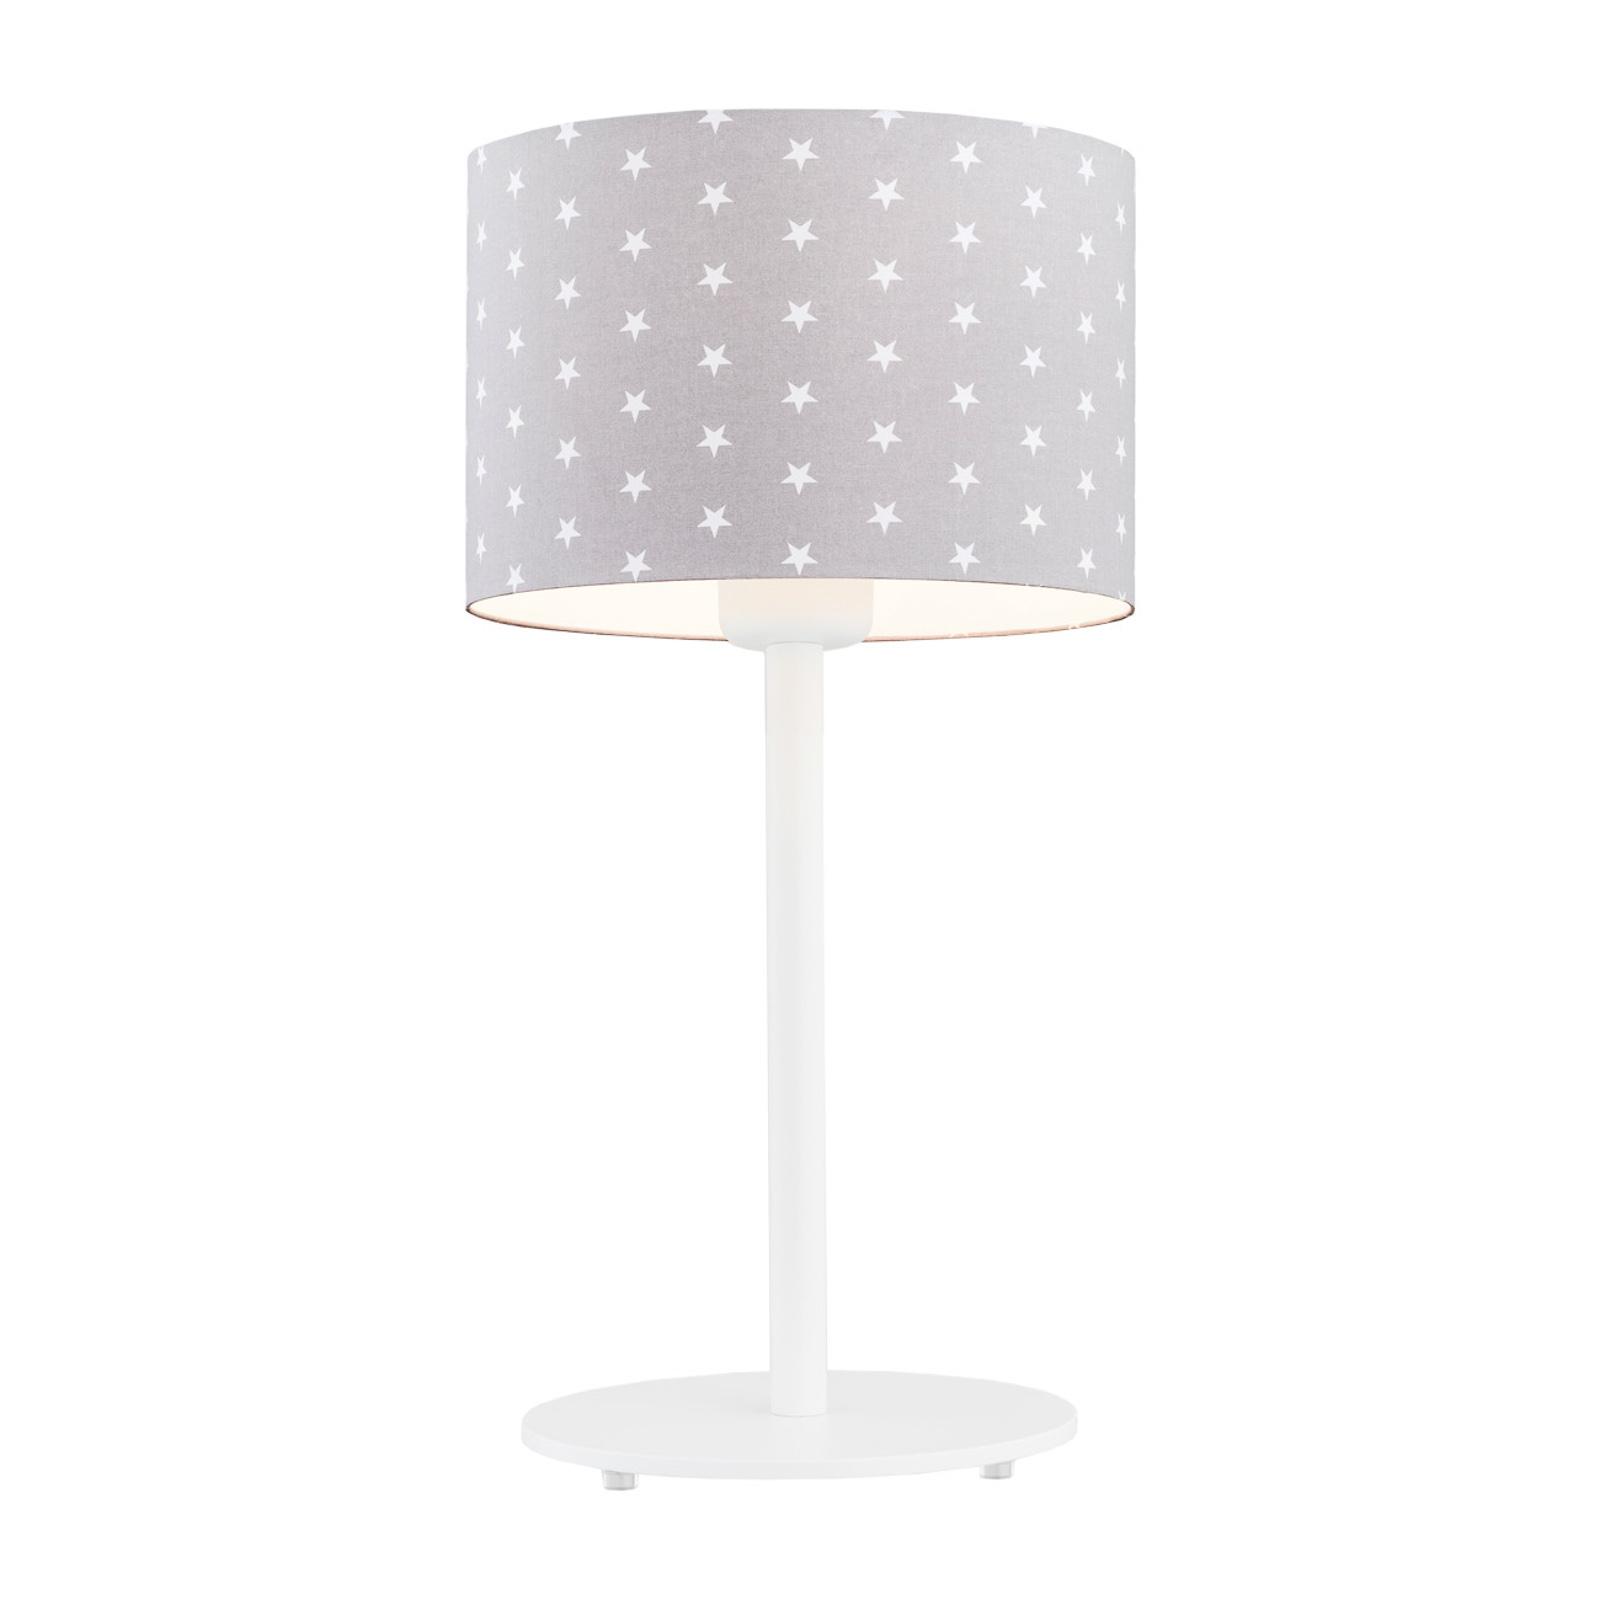 Moa bordlampe, grå stofskærm/hvide stjerner